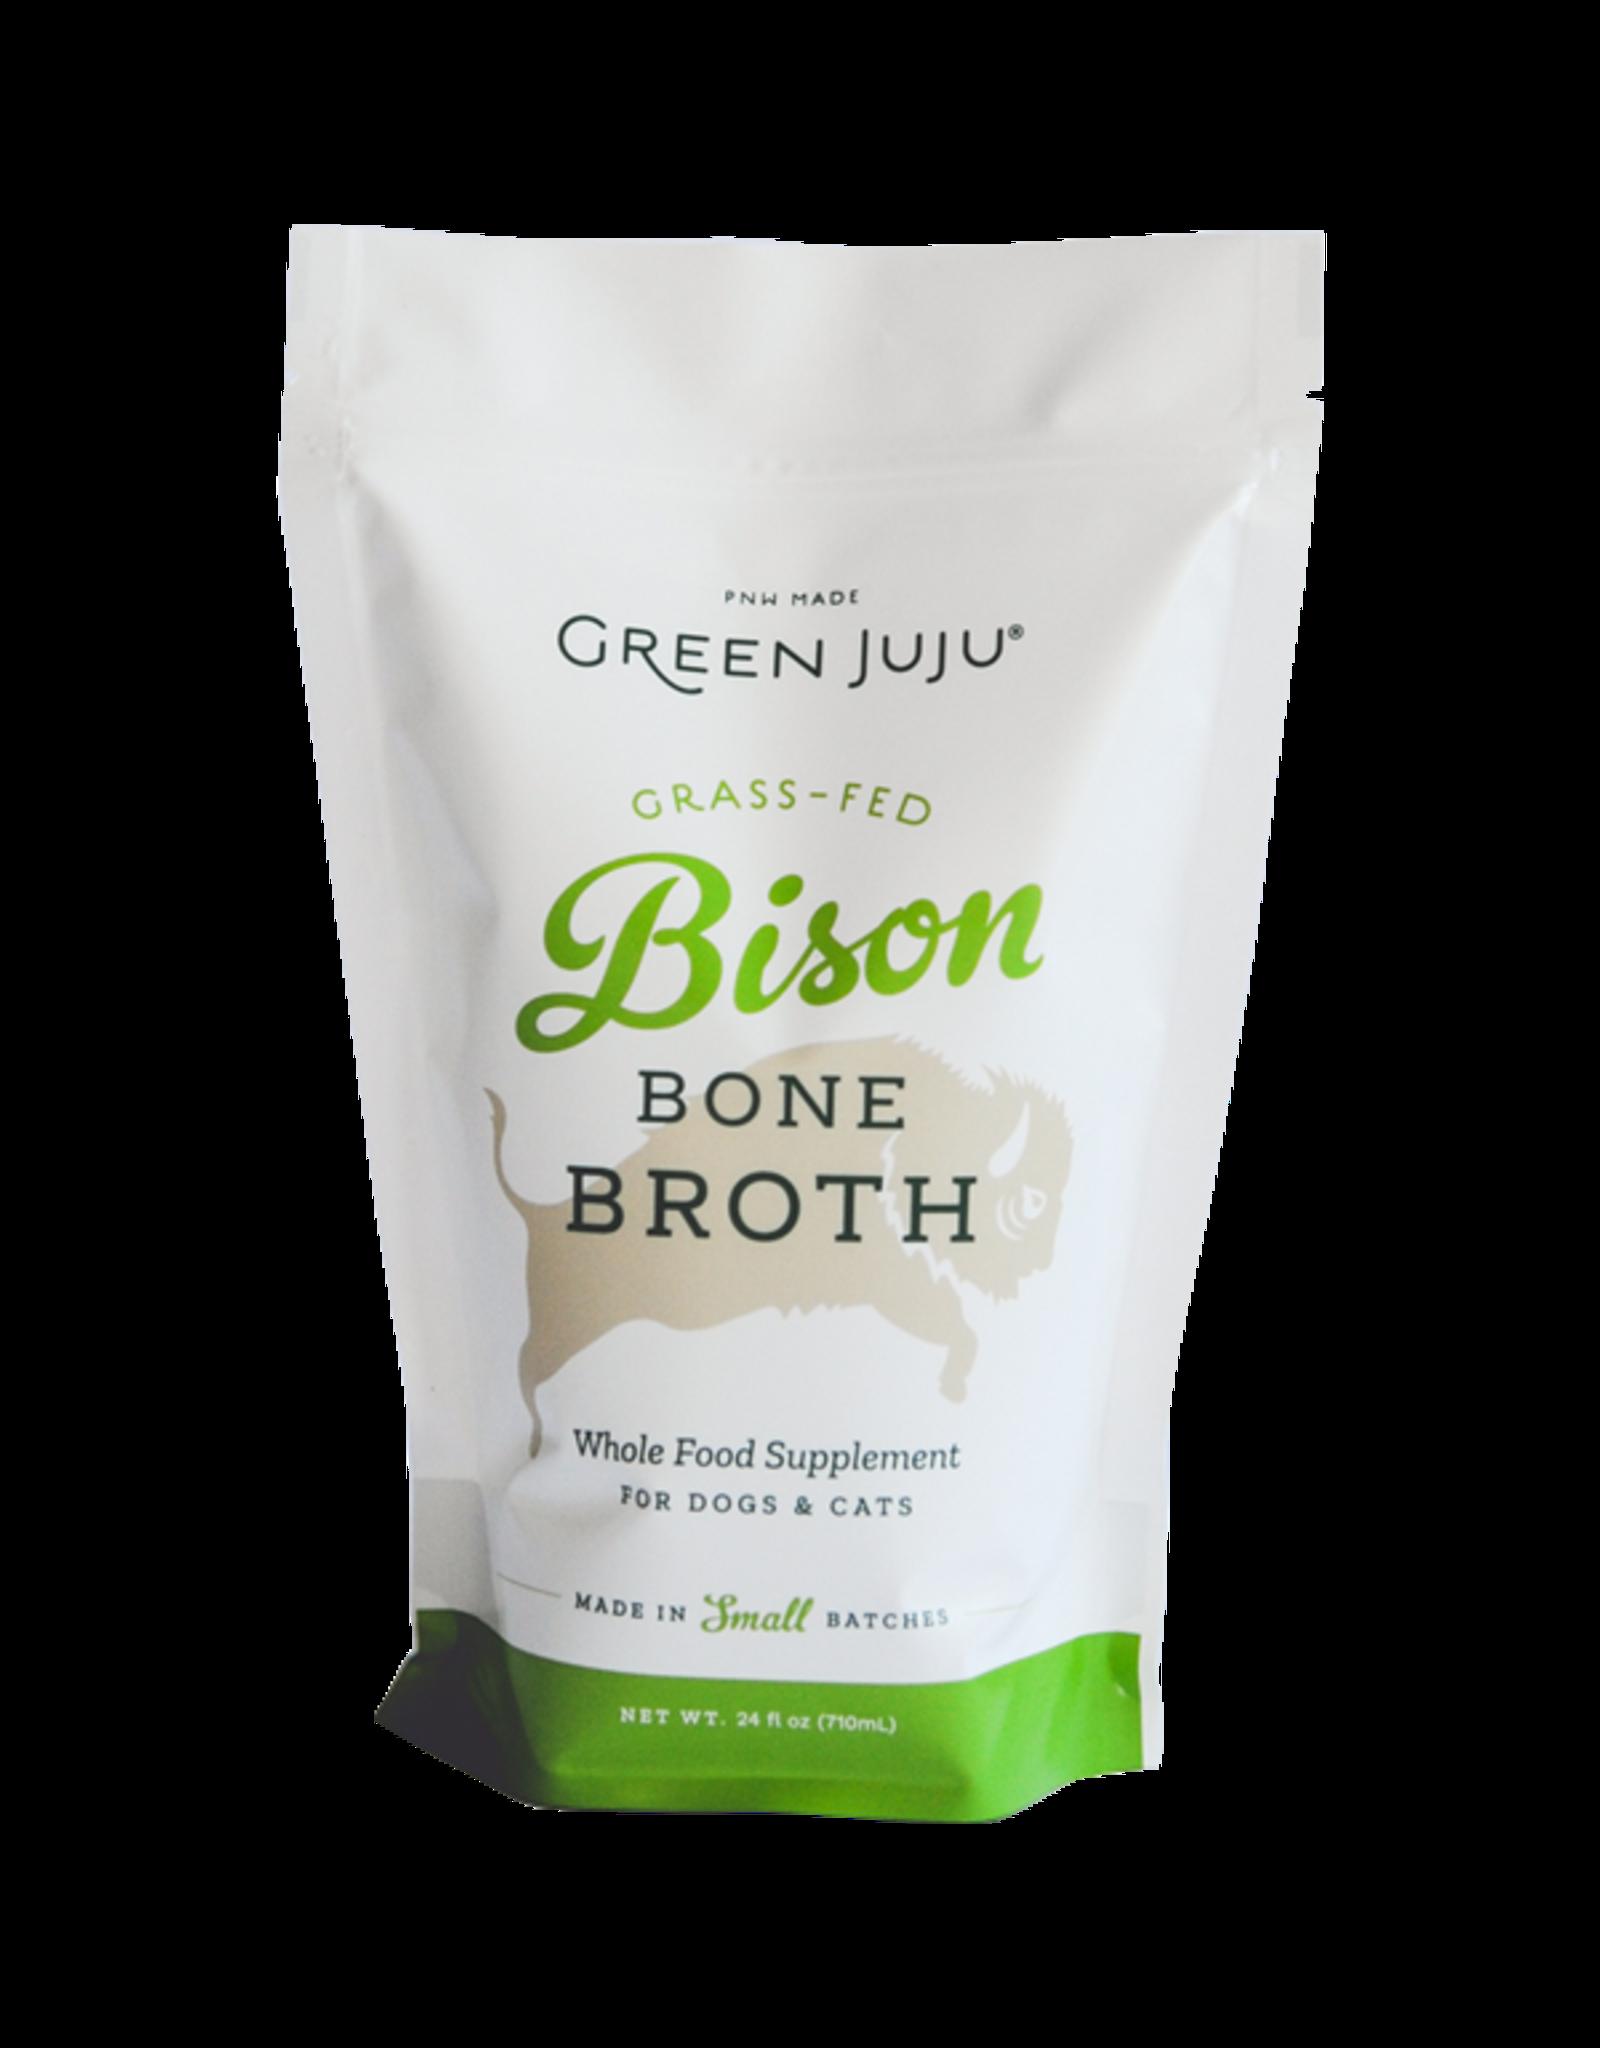 Green Juju Green Juju Bison Bone Broth 24oz